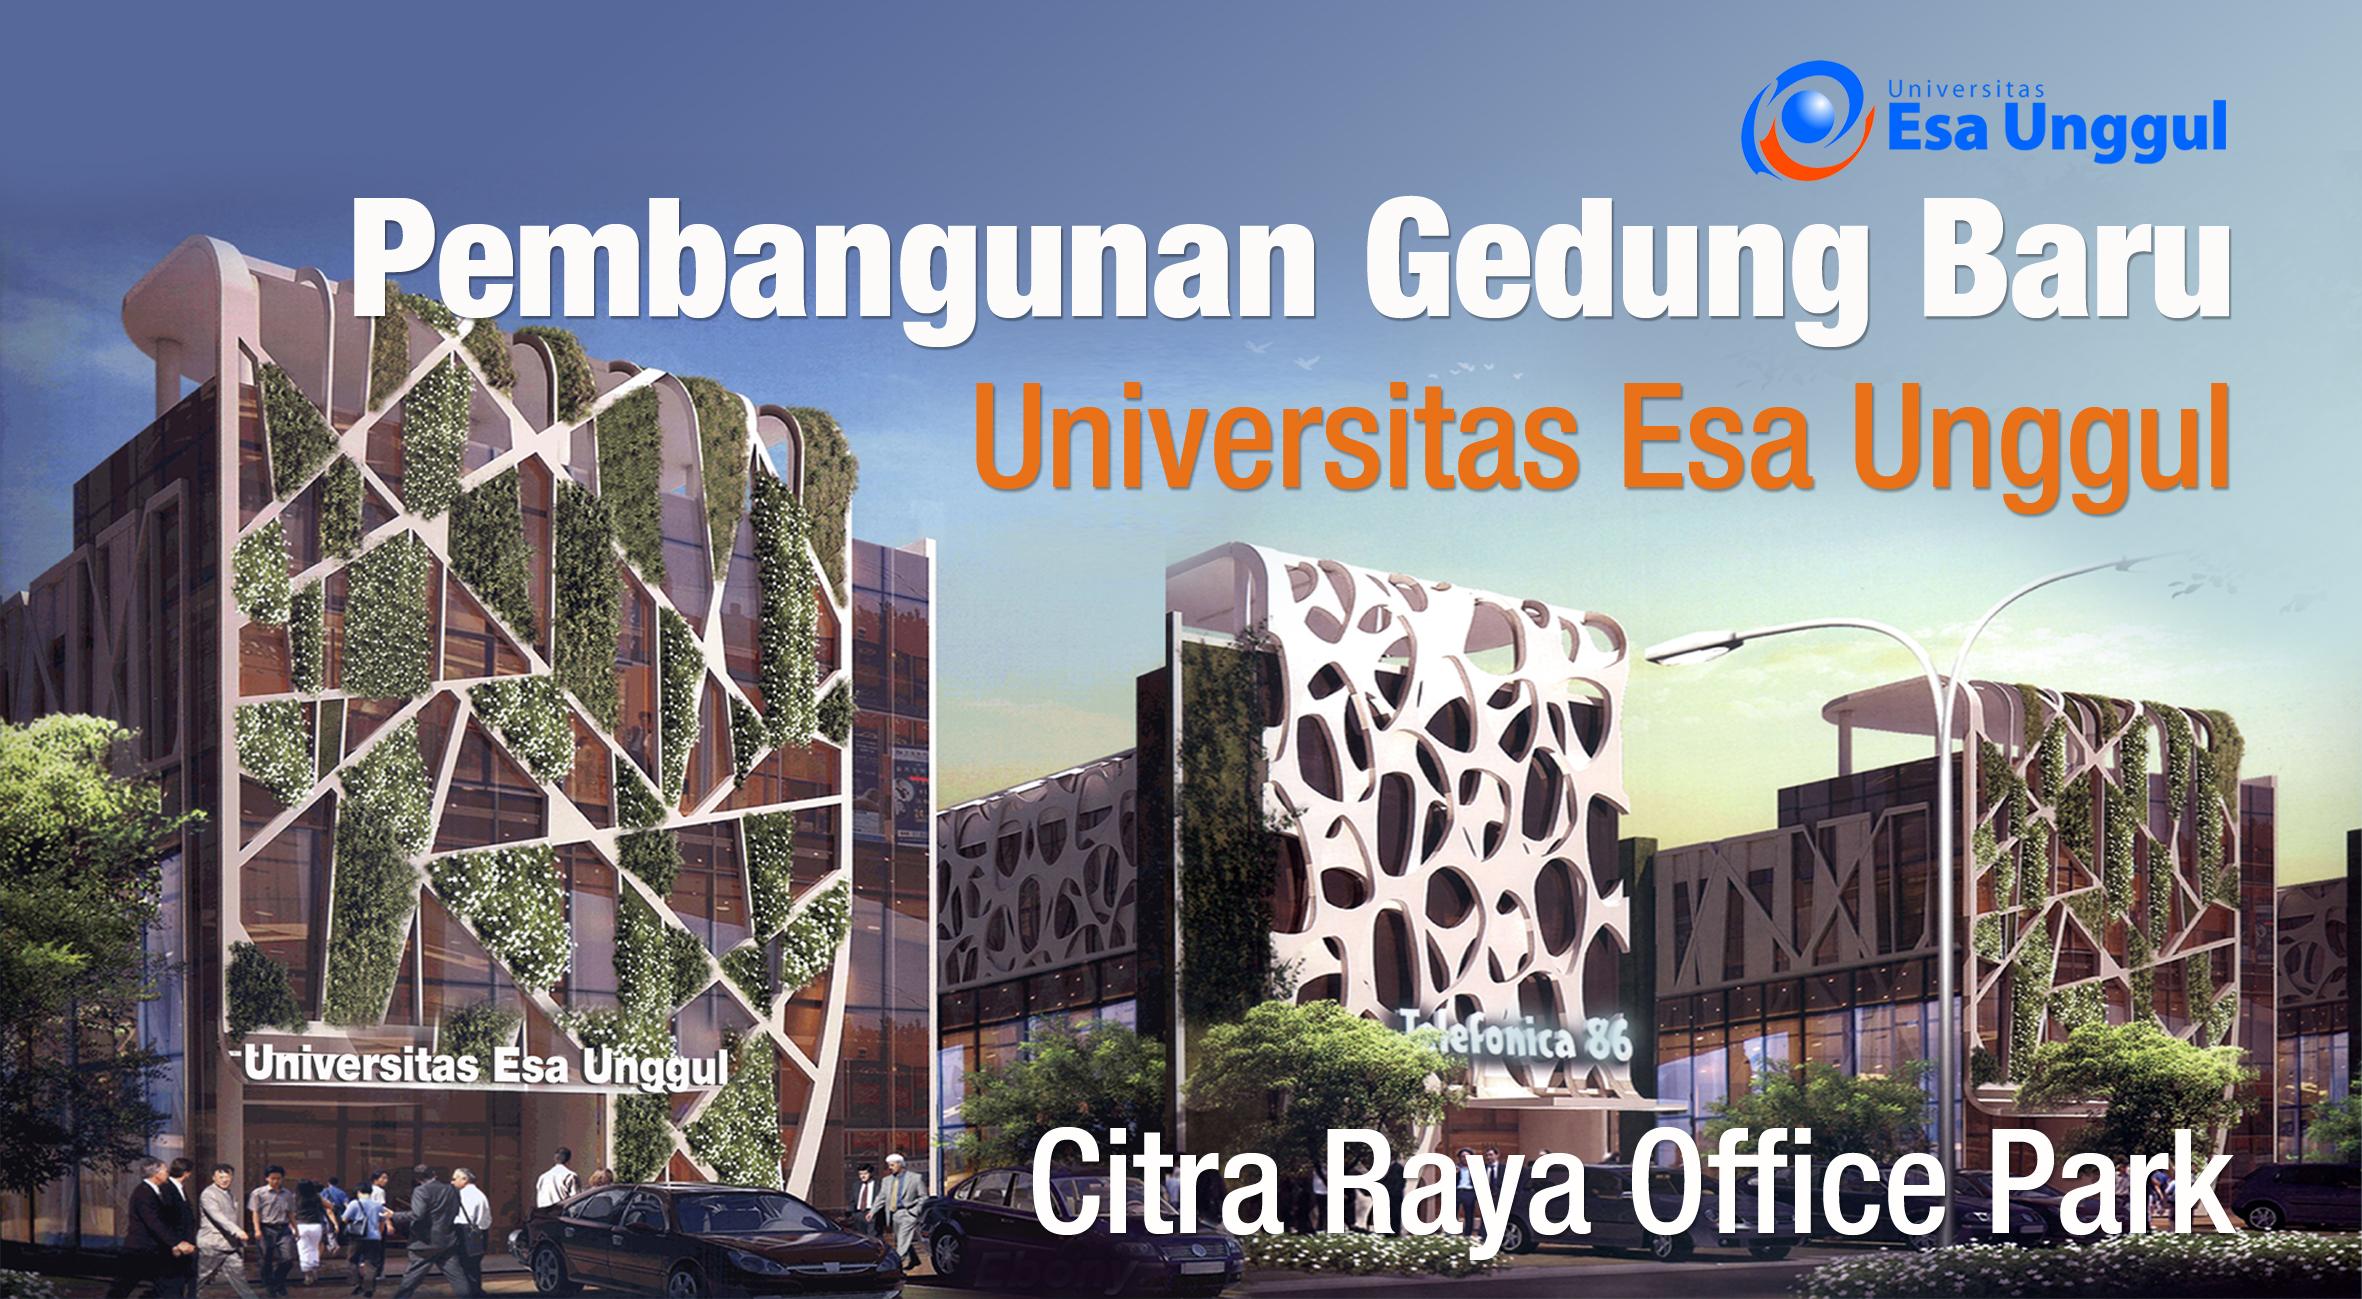 Pembangunan Gedung Baru Universitas Esa Unggul di Citra Raya Office Park, Kabupaten Tangerang